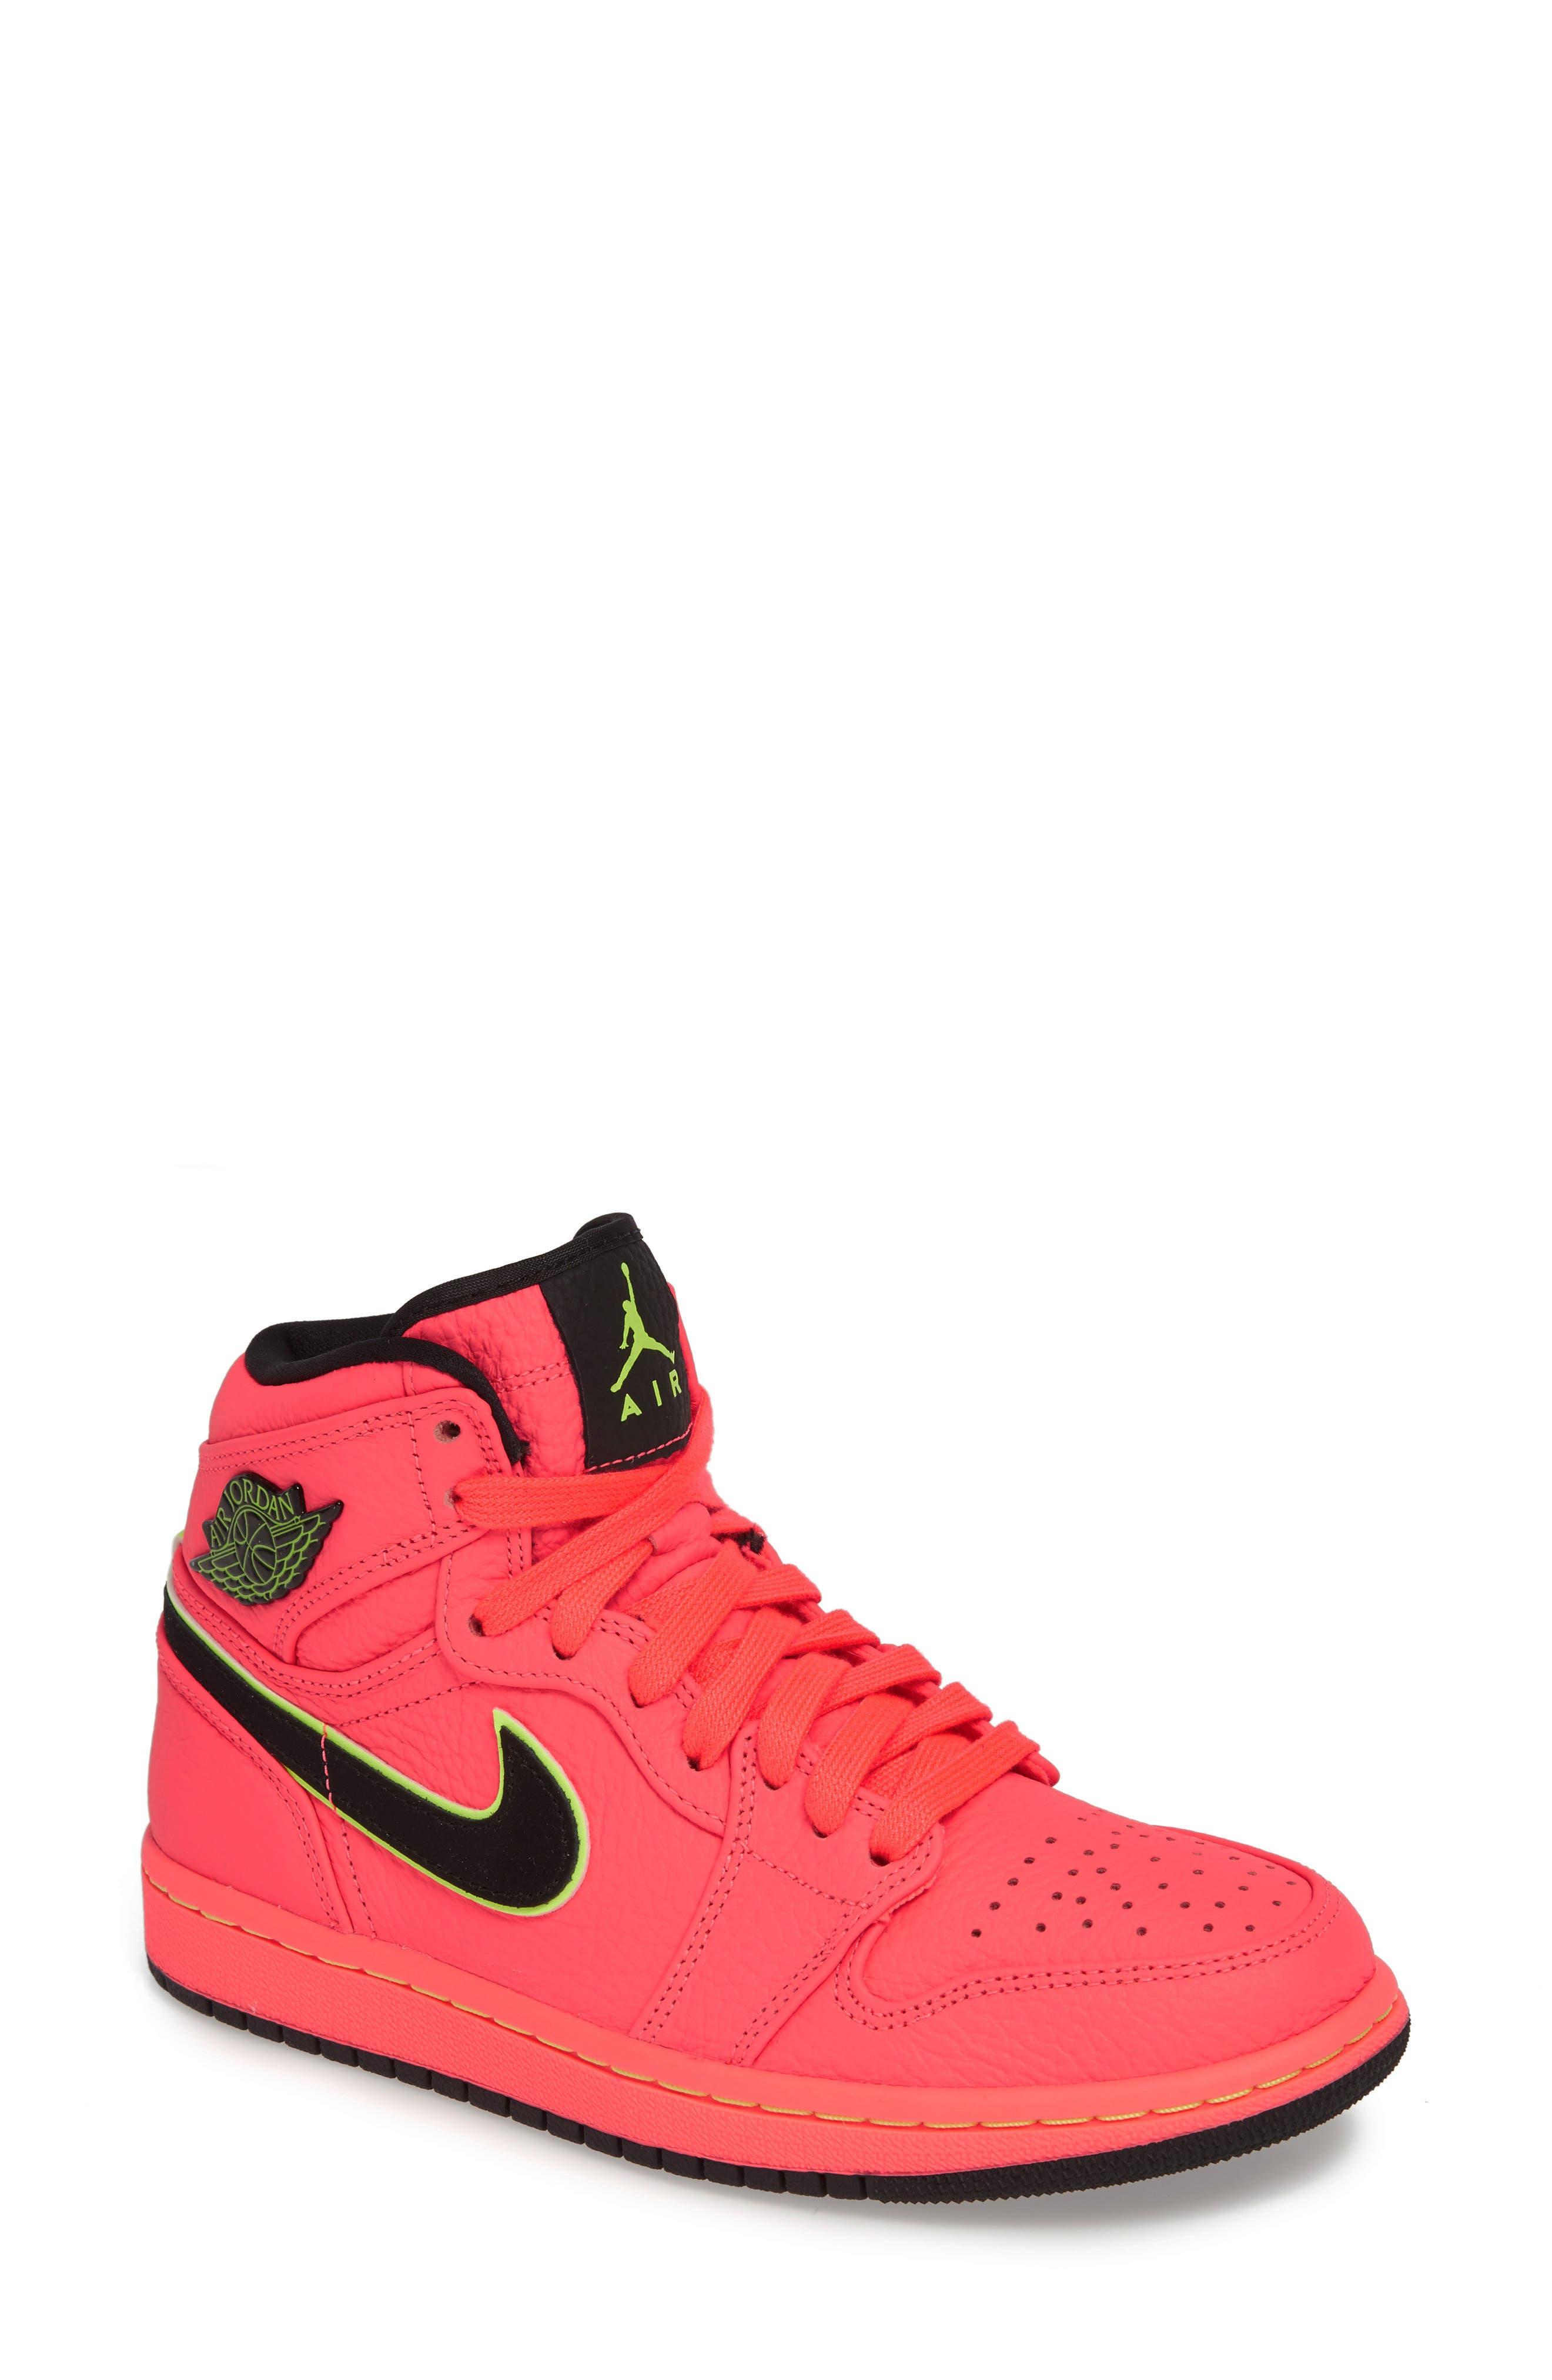 on sale 5c31a 04644 Women s Jordan Nordstrom x Nike   Nordstrom